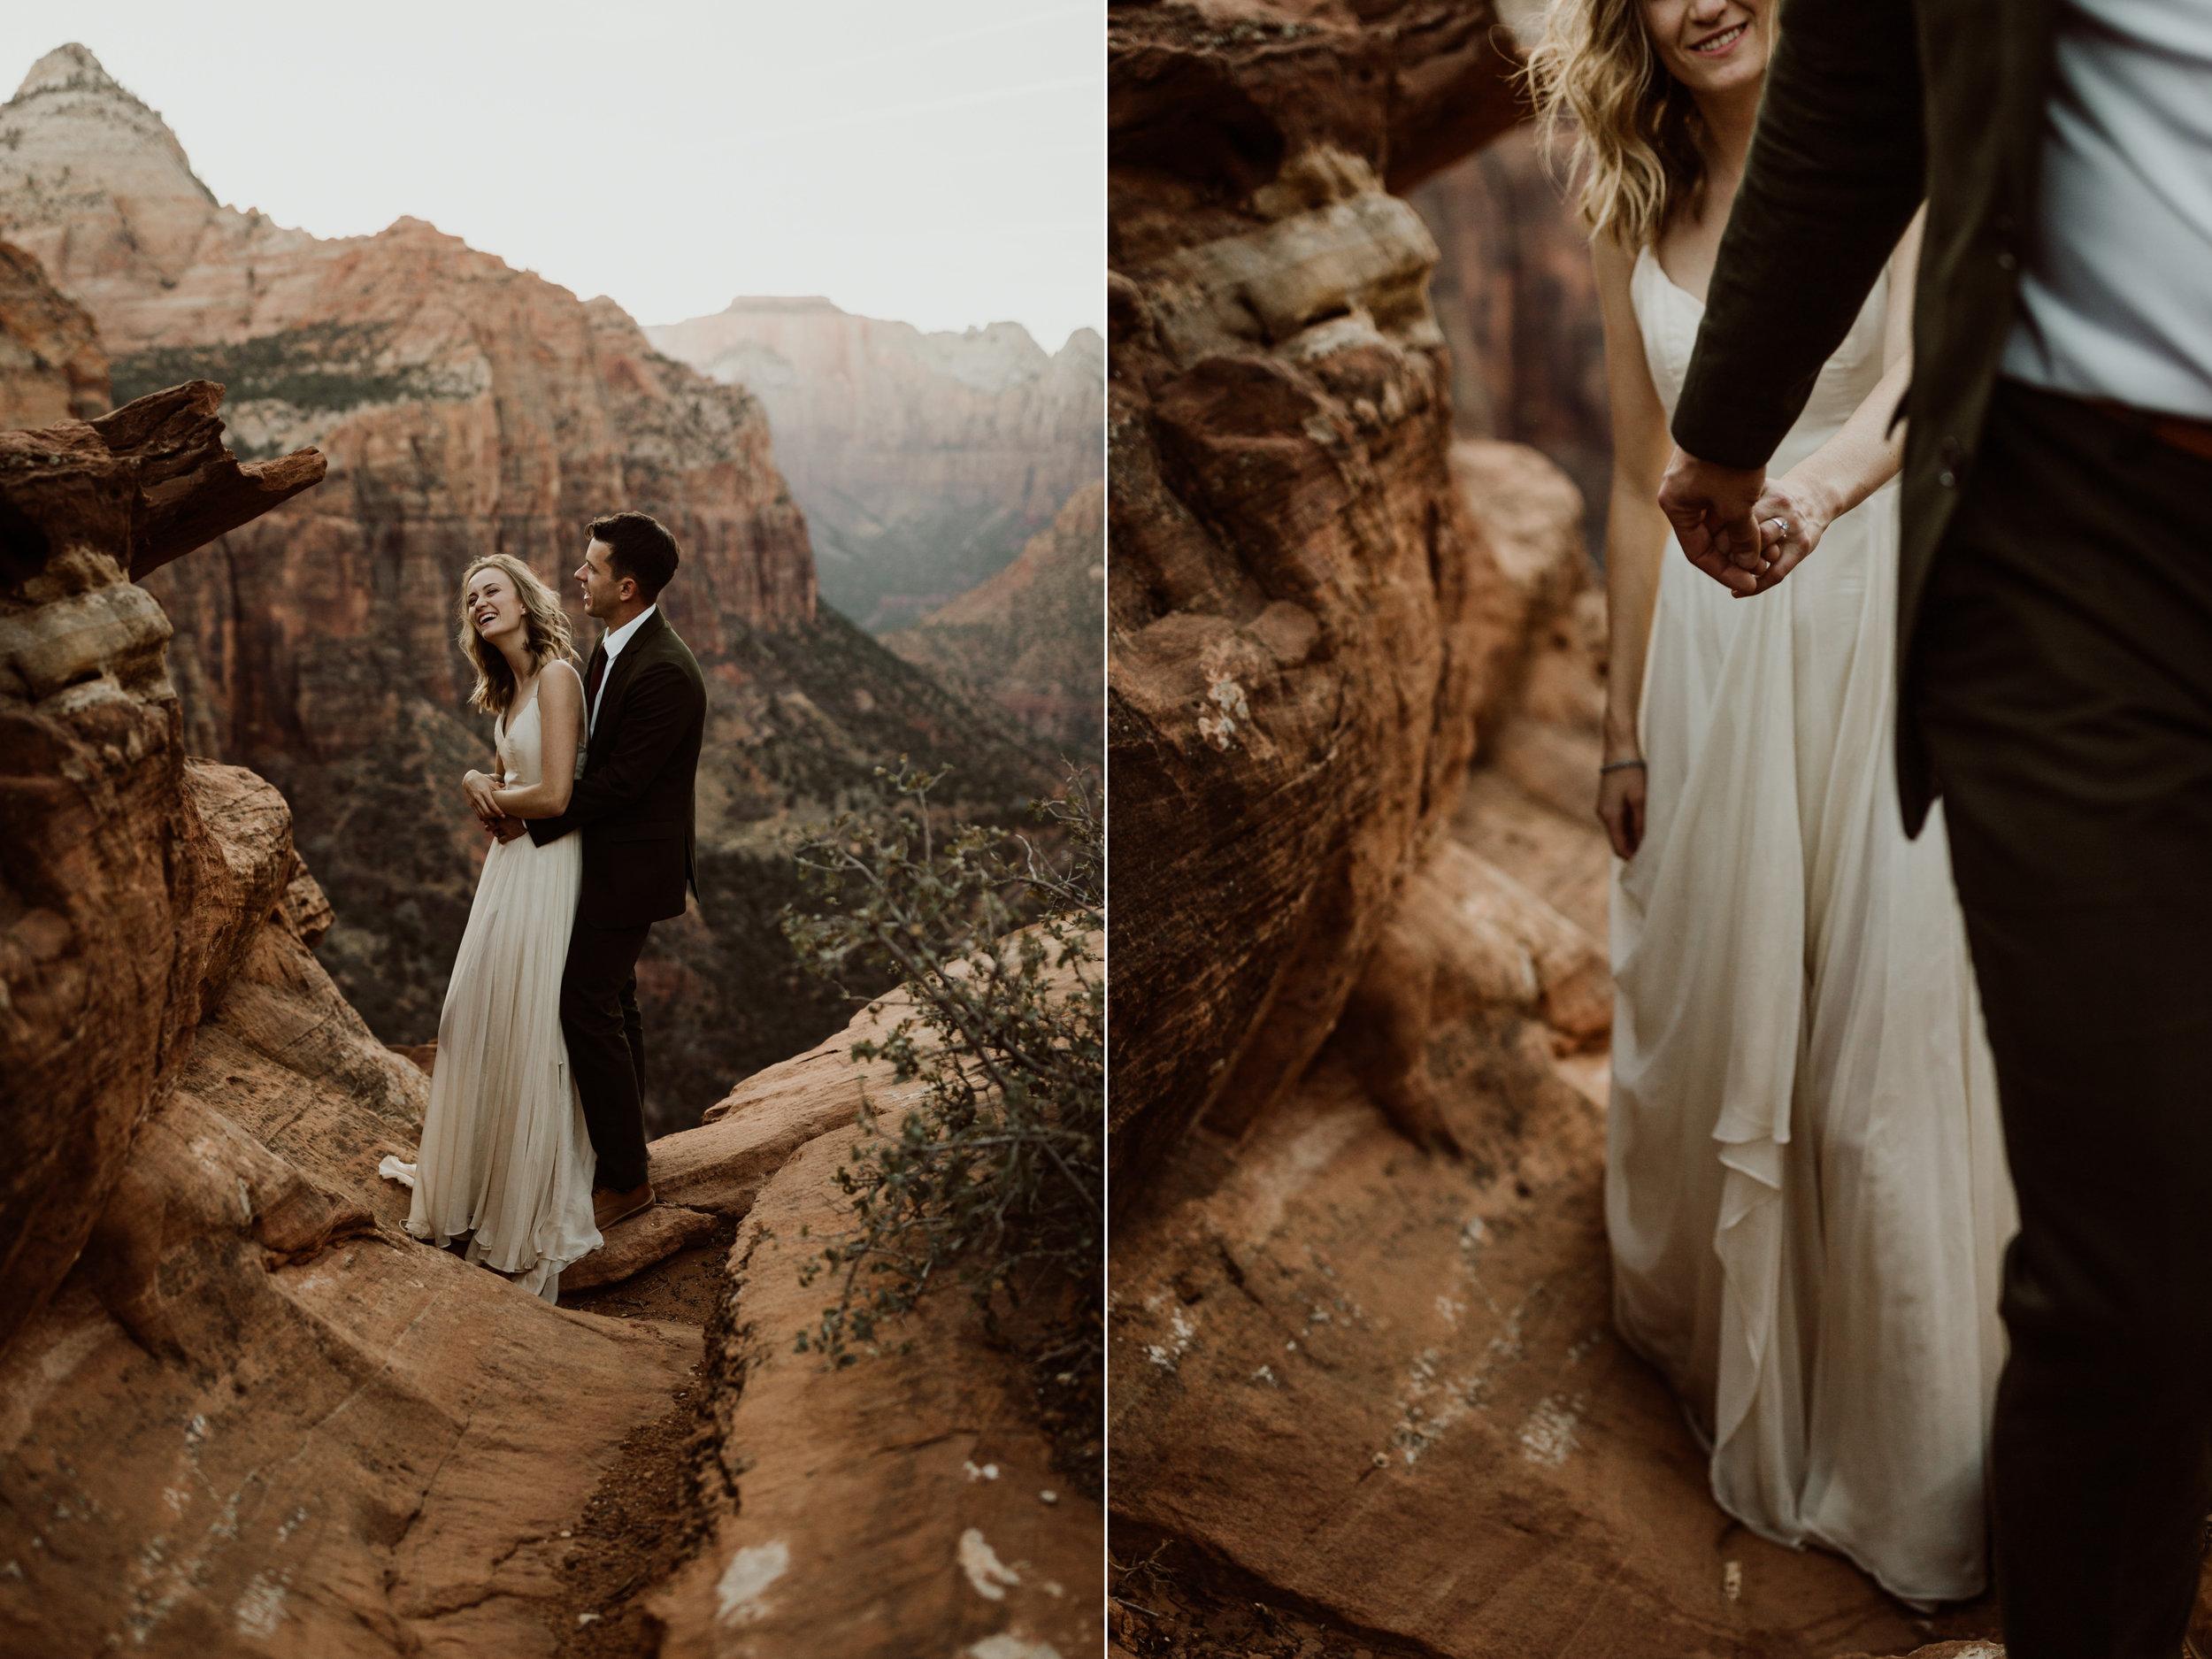 zion-national-park-wedding-170.jpg